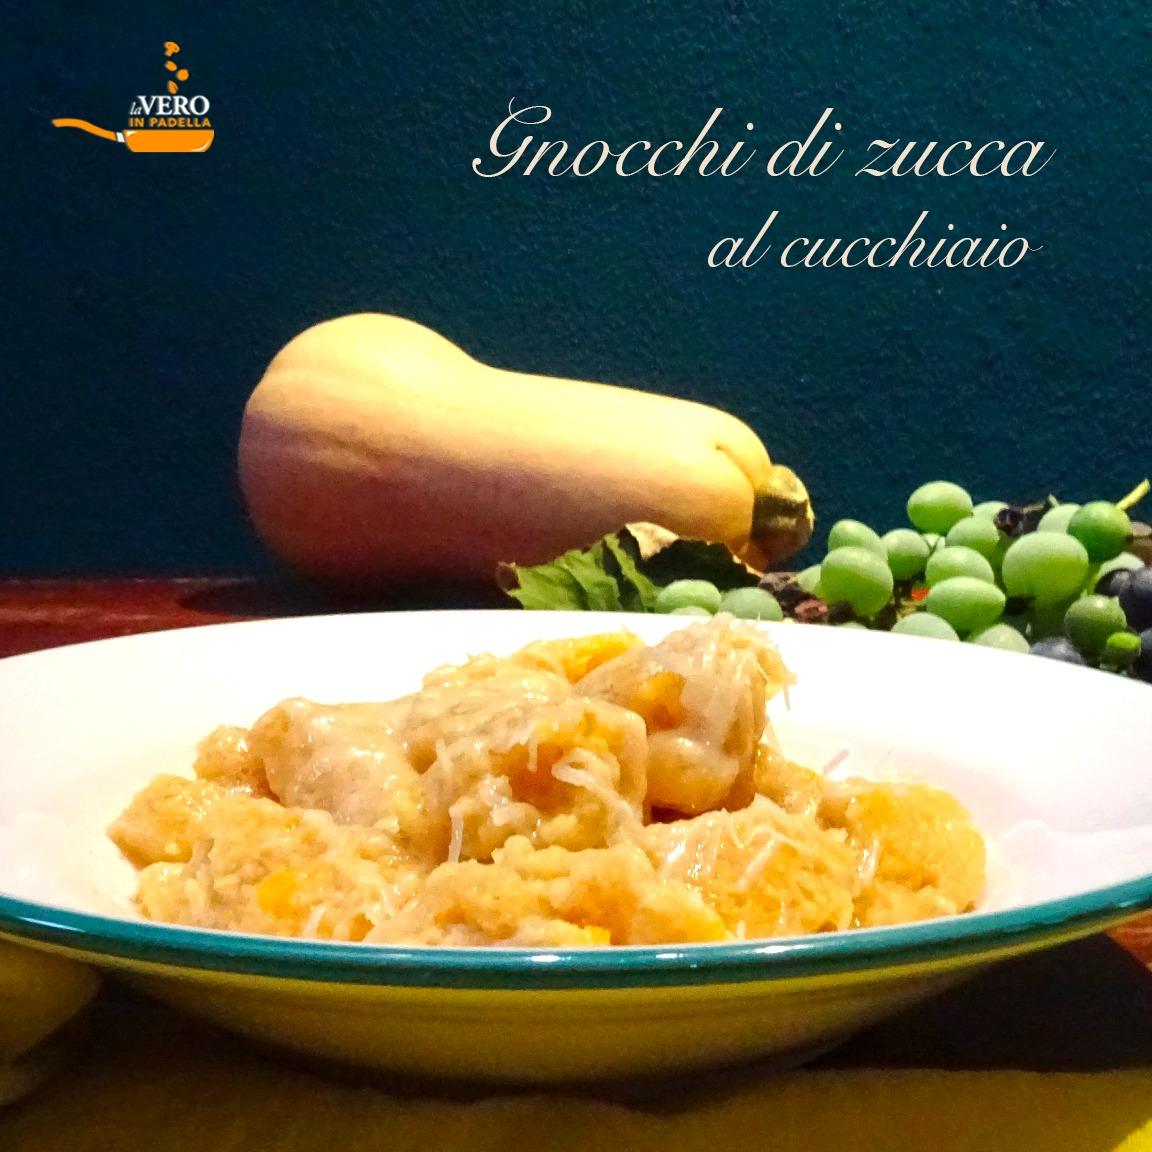 Ricetta Gnocchi Di Zucca Fatto In Casa Da Benedetta.Gnocchi Di Zucca Al Cucchiaio Laveroinpadella